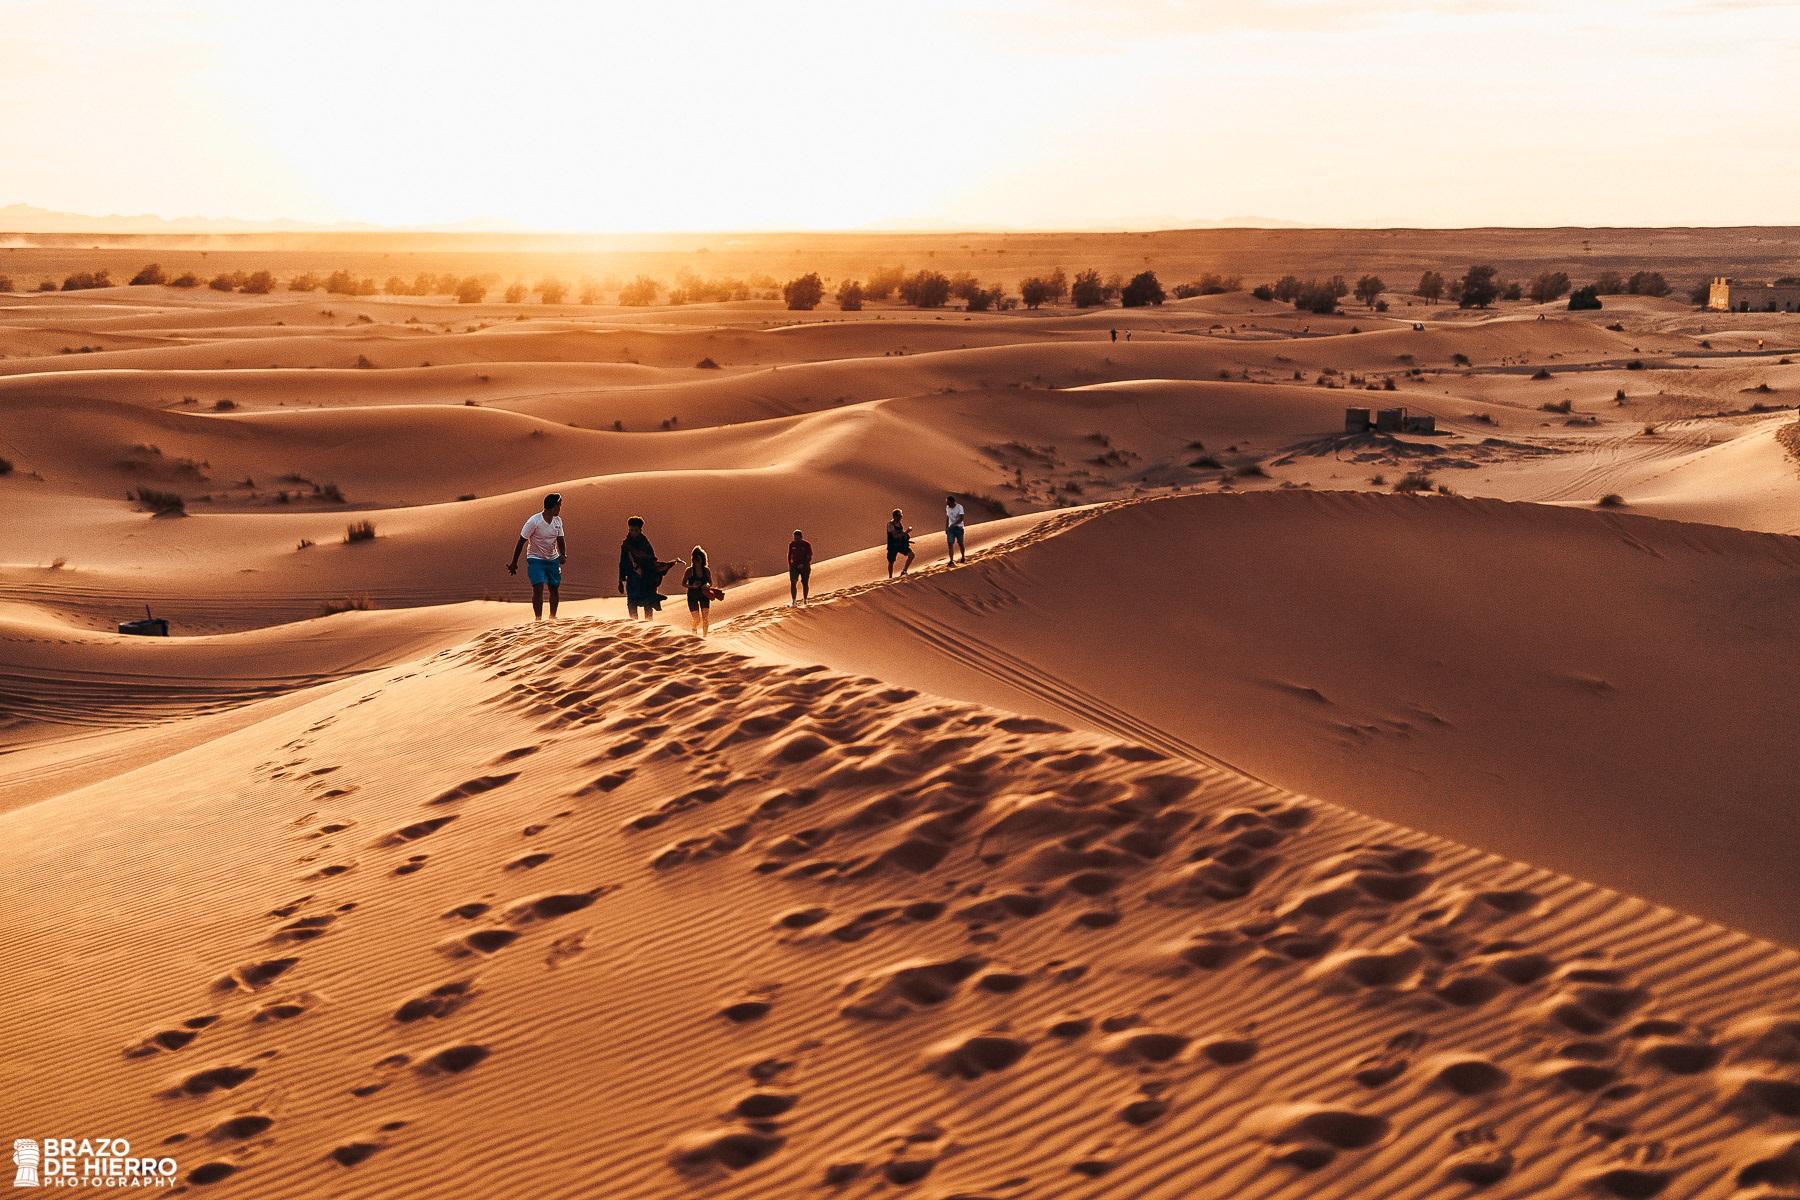 Vive el desierto